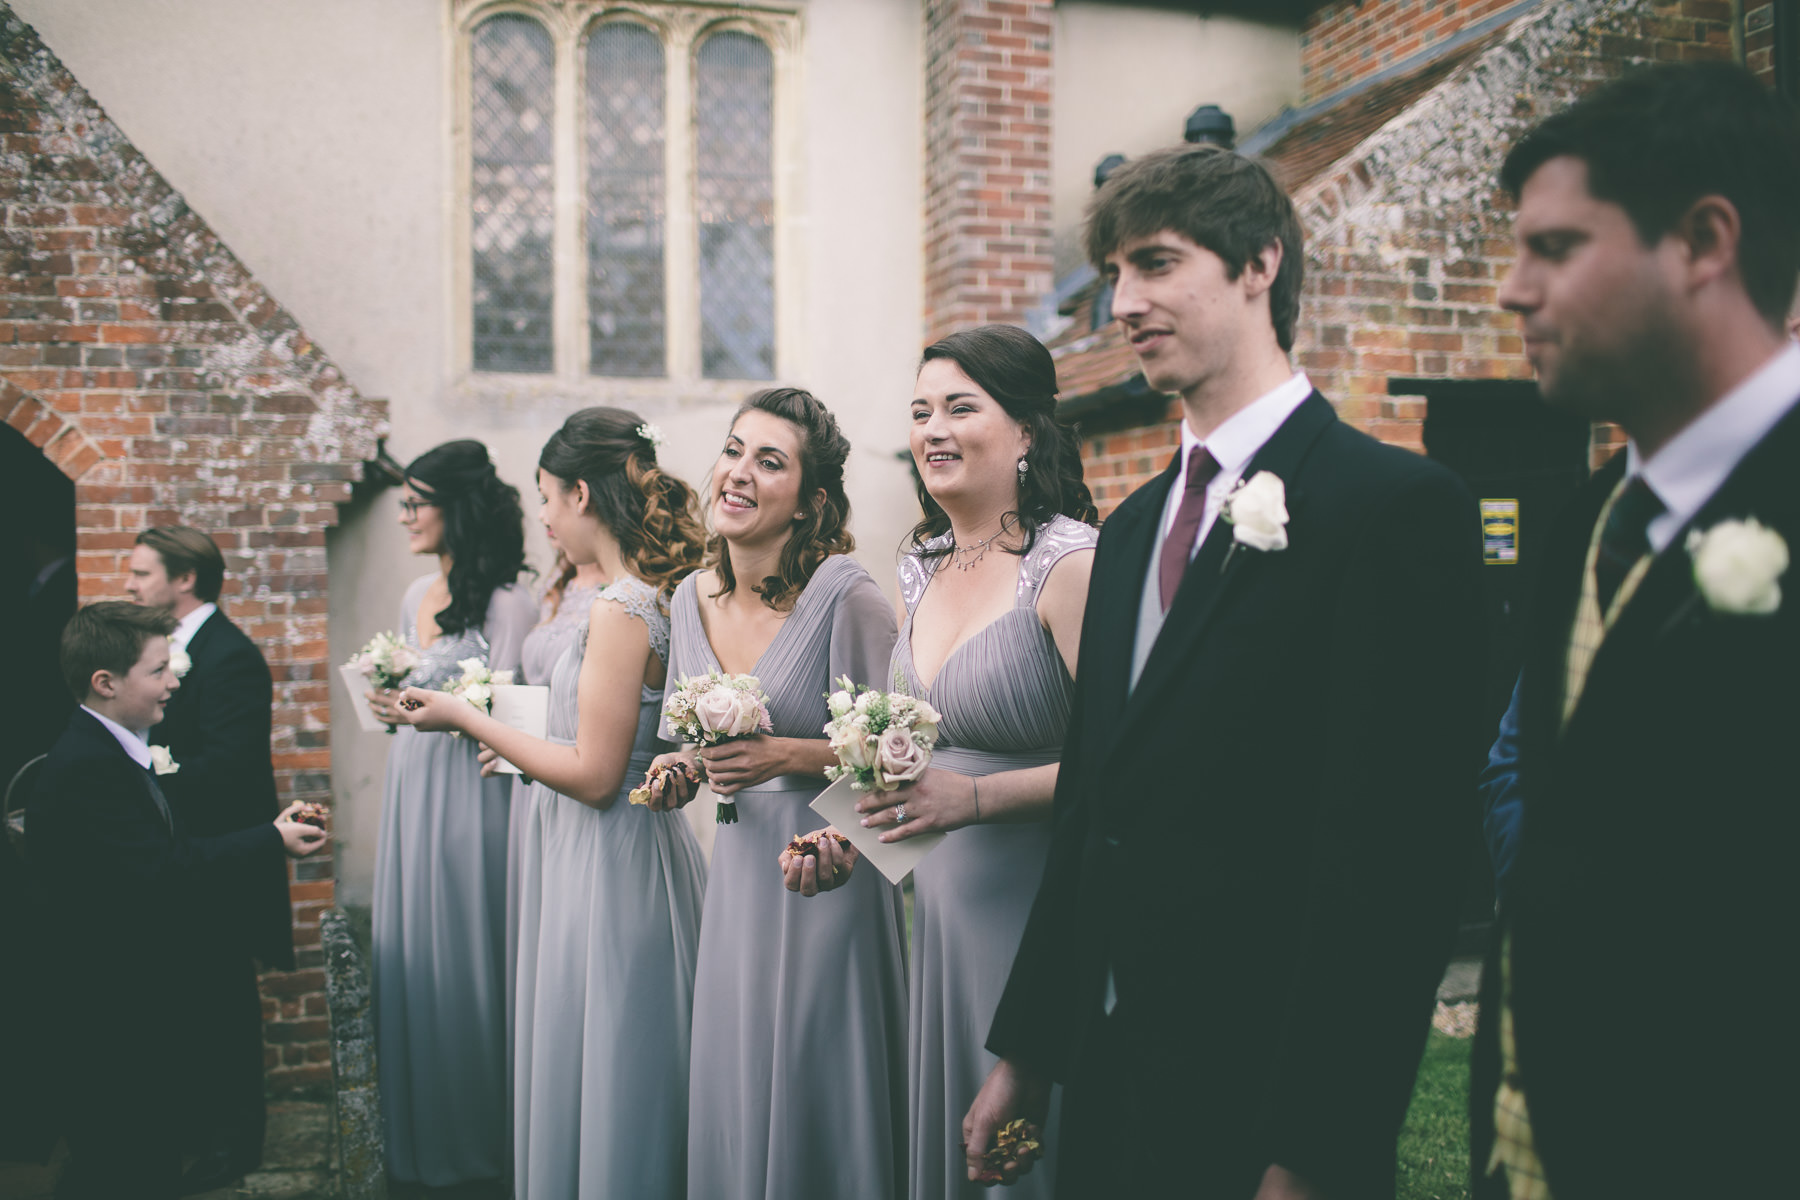 Pamber-Place-wedding-photography-basingstoke-hampshire-163